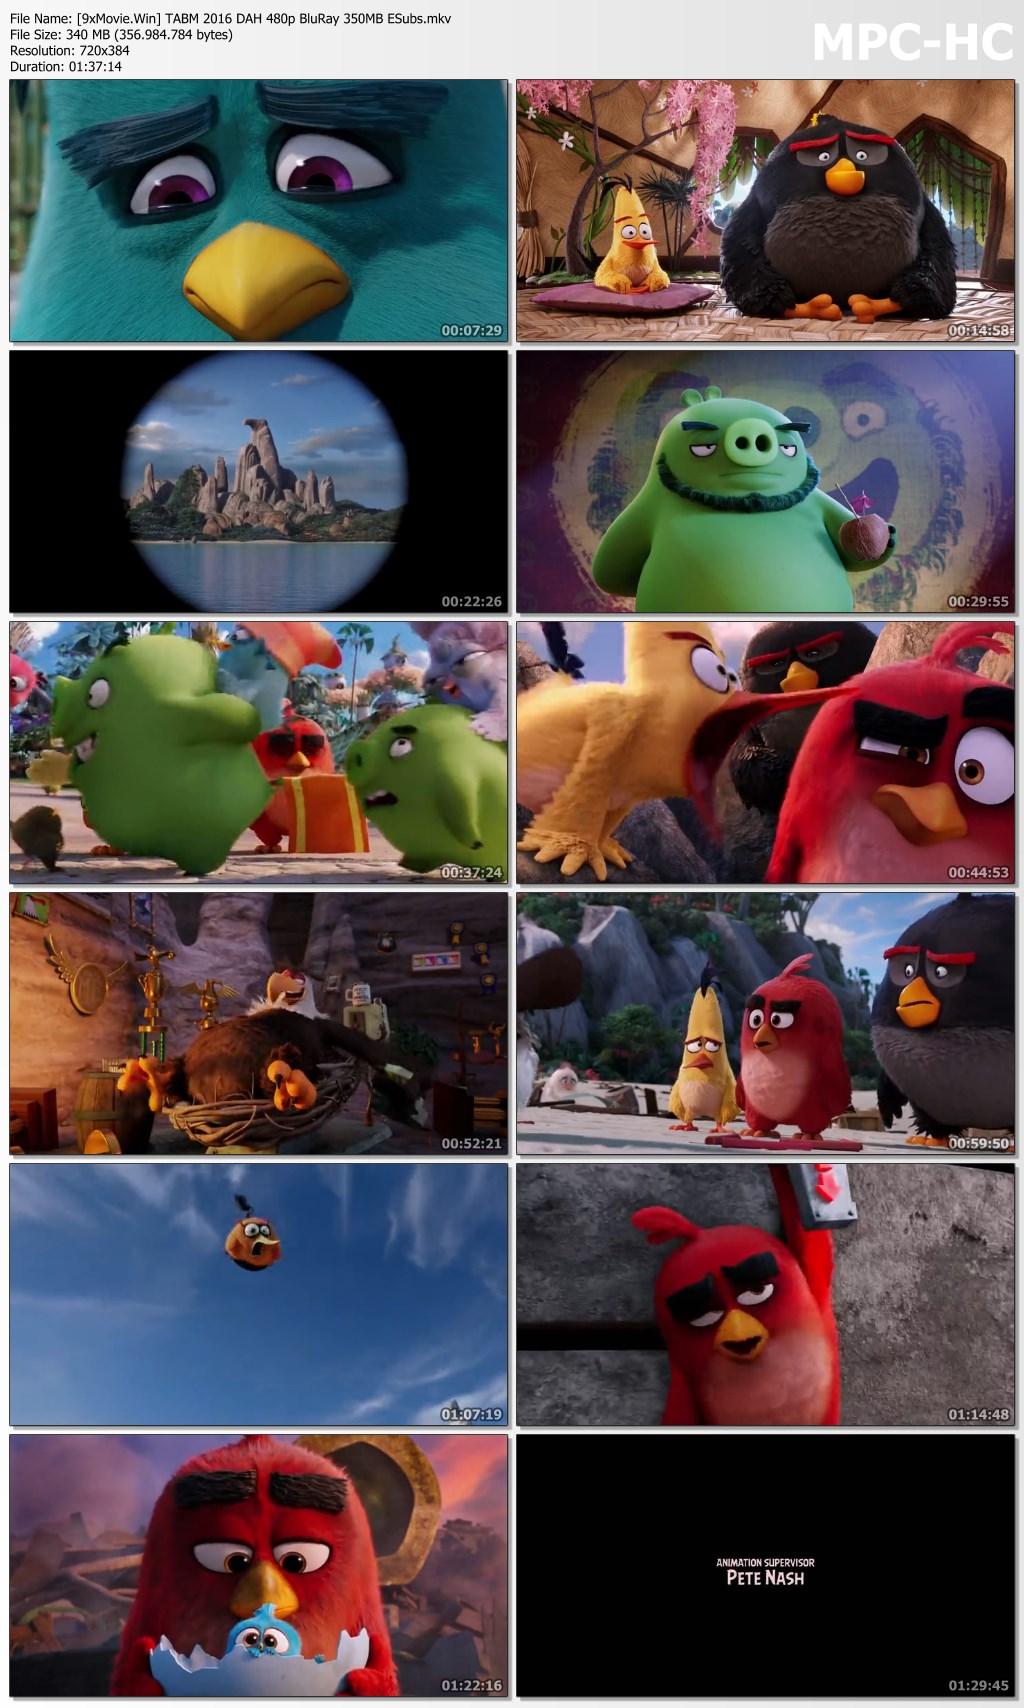 The Angry Birds Movie 2016 Dual Audio Hindi 480p BluRay x264 350MB ESubs